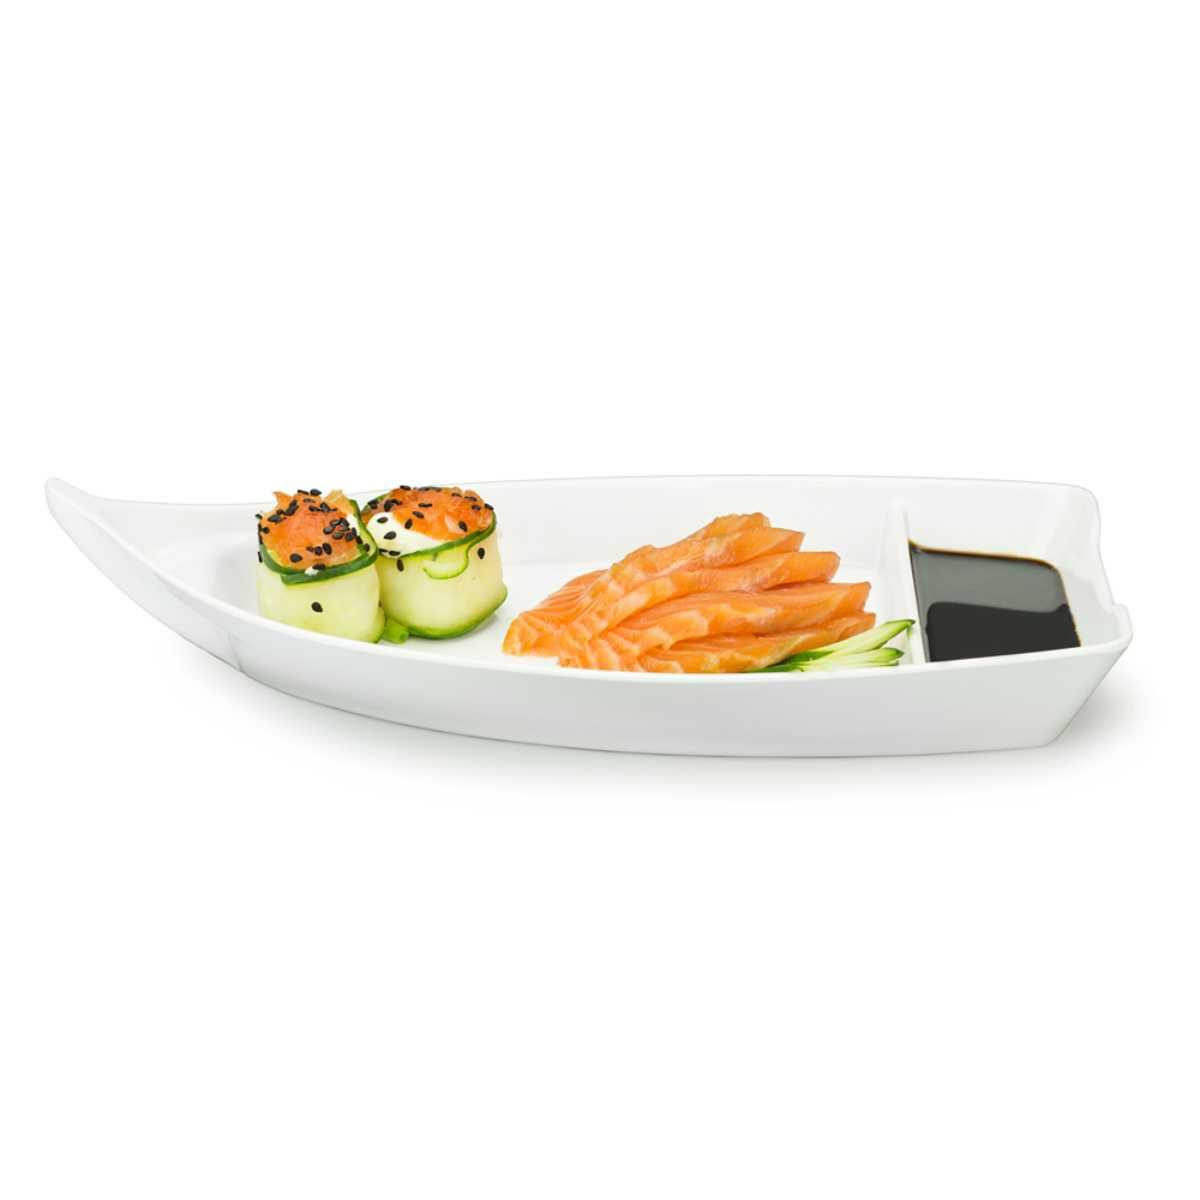 Barco Japônes Para Sushi Sashimi 26 X 12 cm Branco Em Melamina Gourmet Mix GX5424